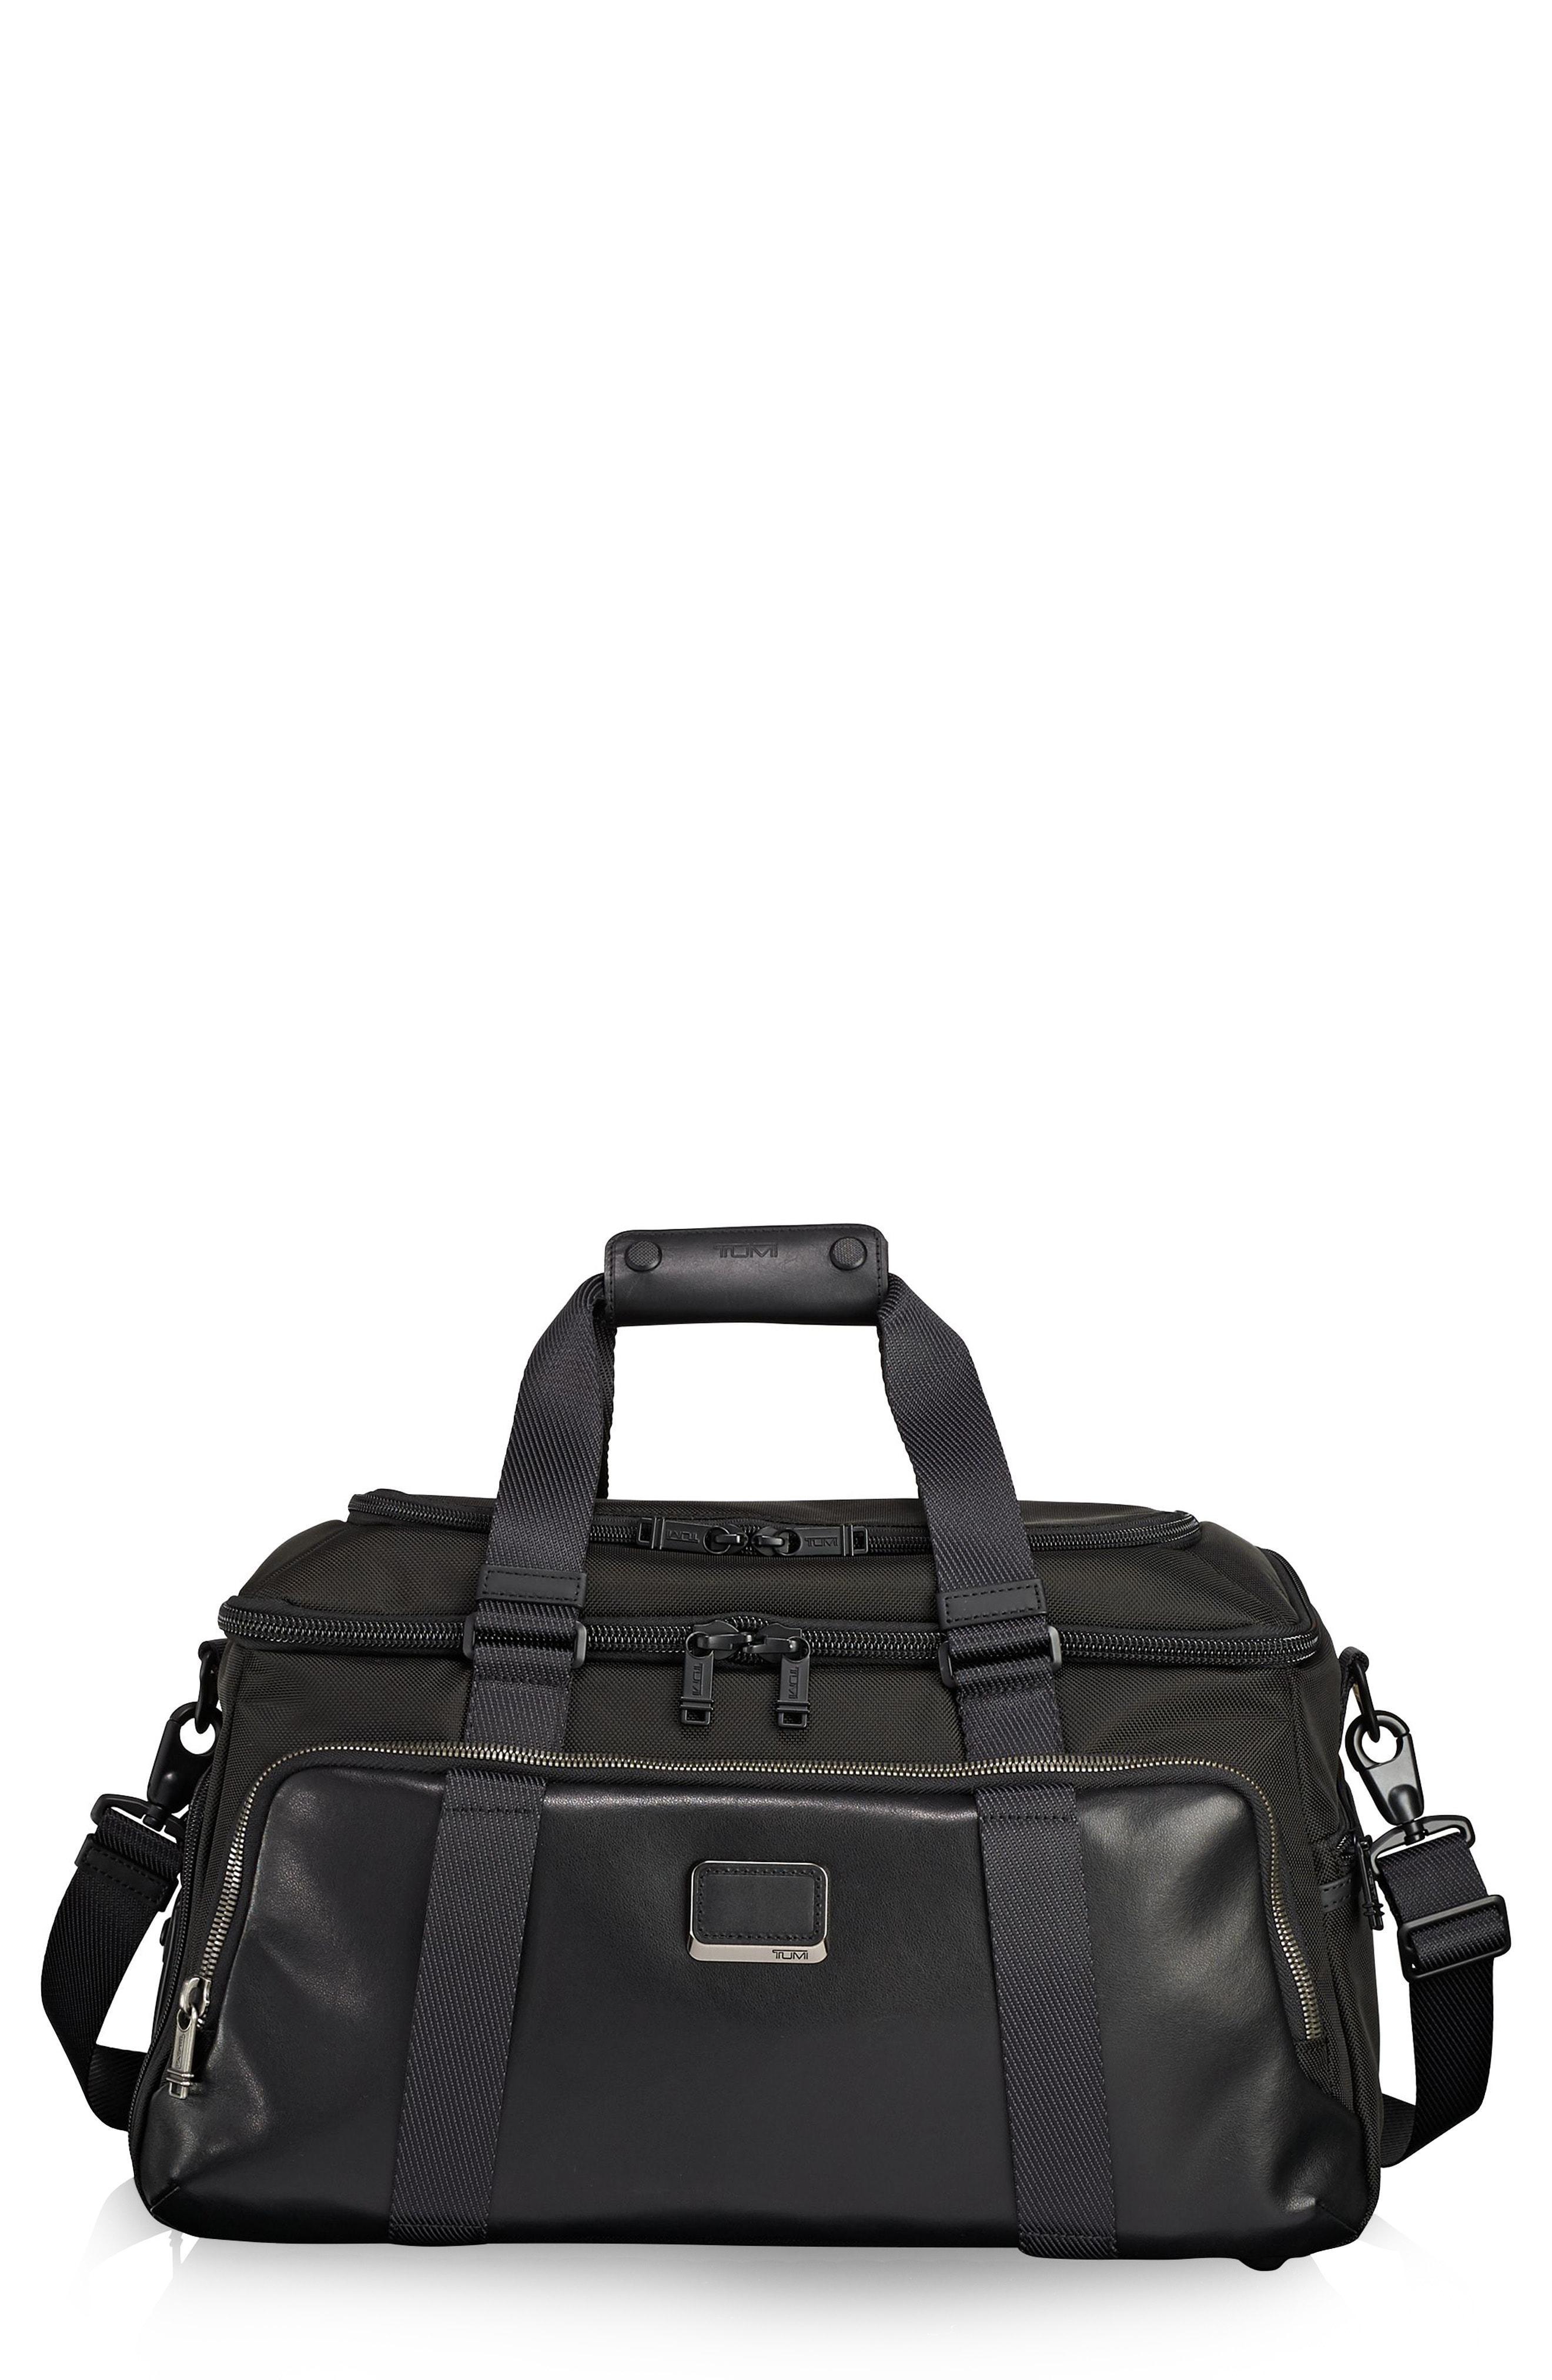 Tumi - Black Alpha Bravo - Mccoy Duffel Bag - for Men - Lyst. View  fullscreen e6da73830eb04